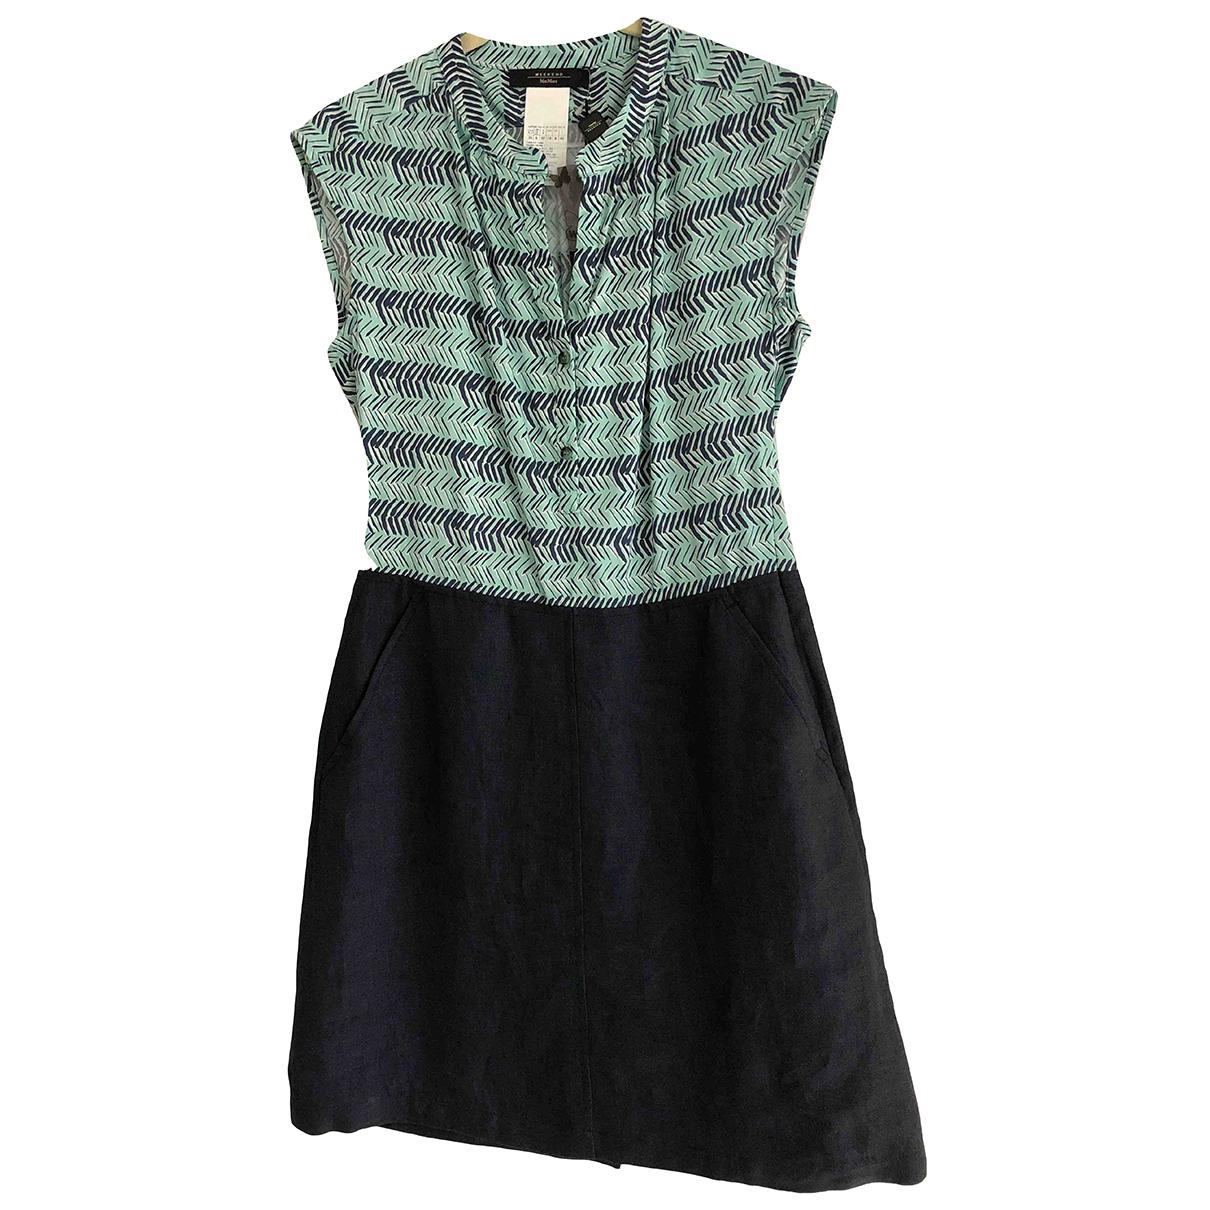 Max Mara Weekend N Navy Cotton dress for Women 8 UK